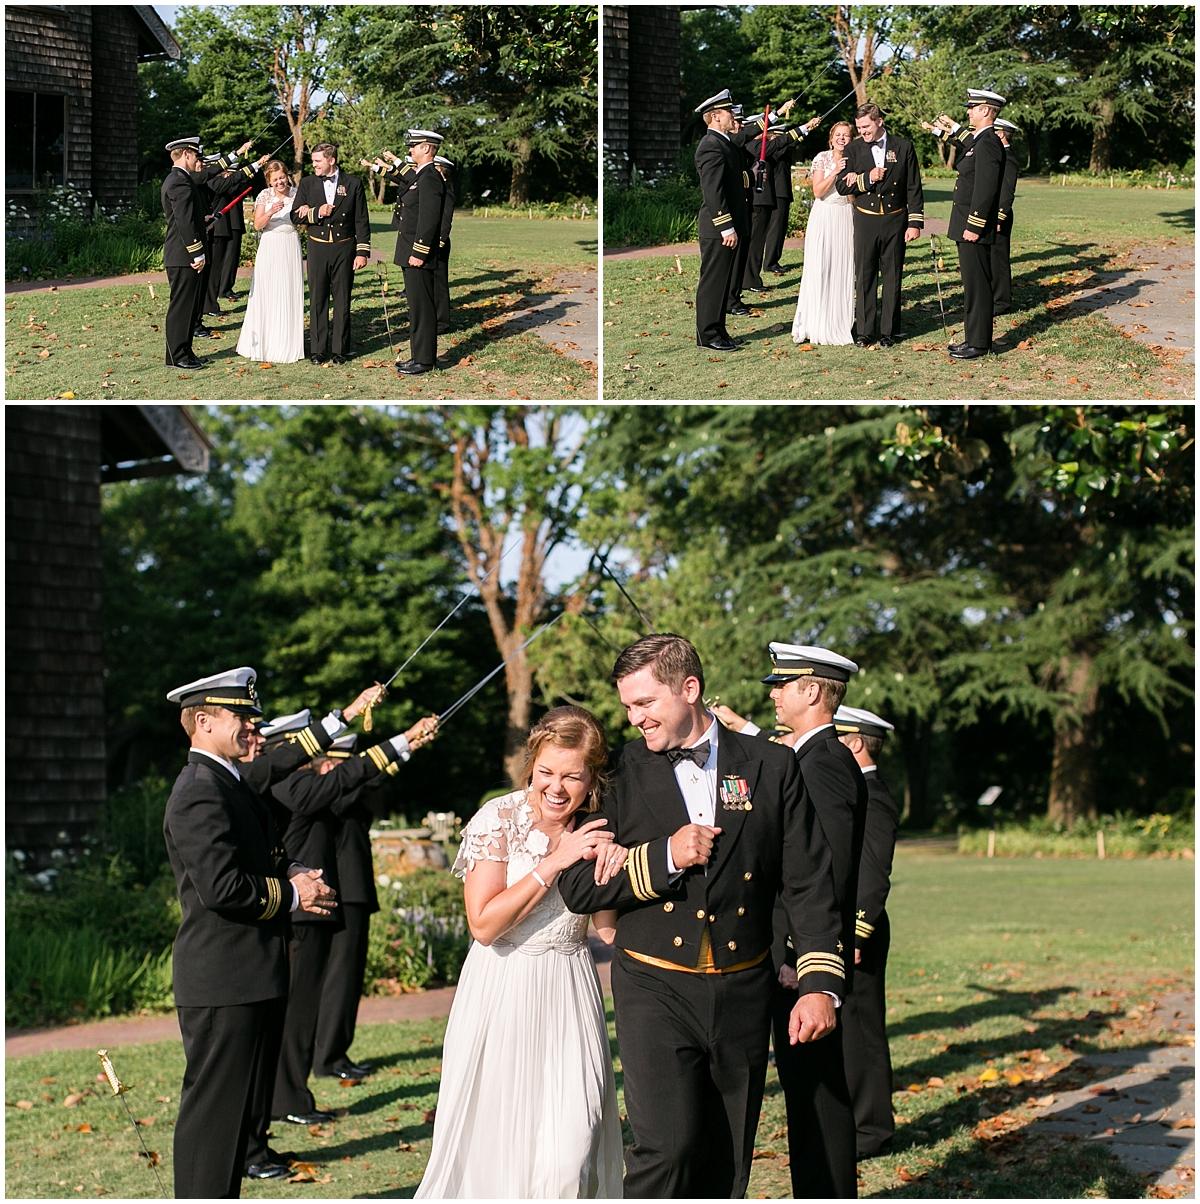 garden wedding at the hermitage museum and gardens reception navy sword arch entrance